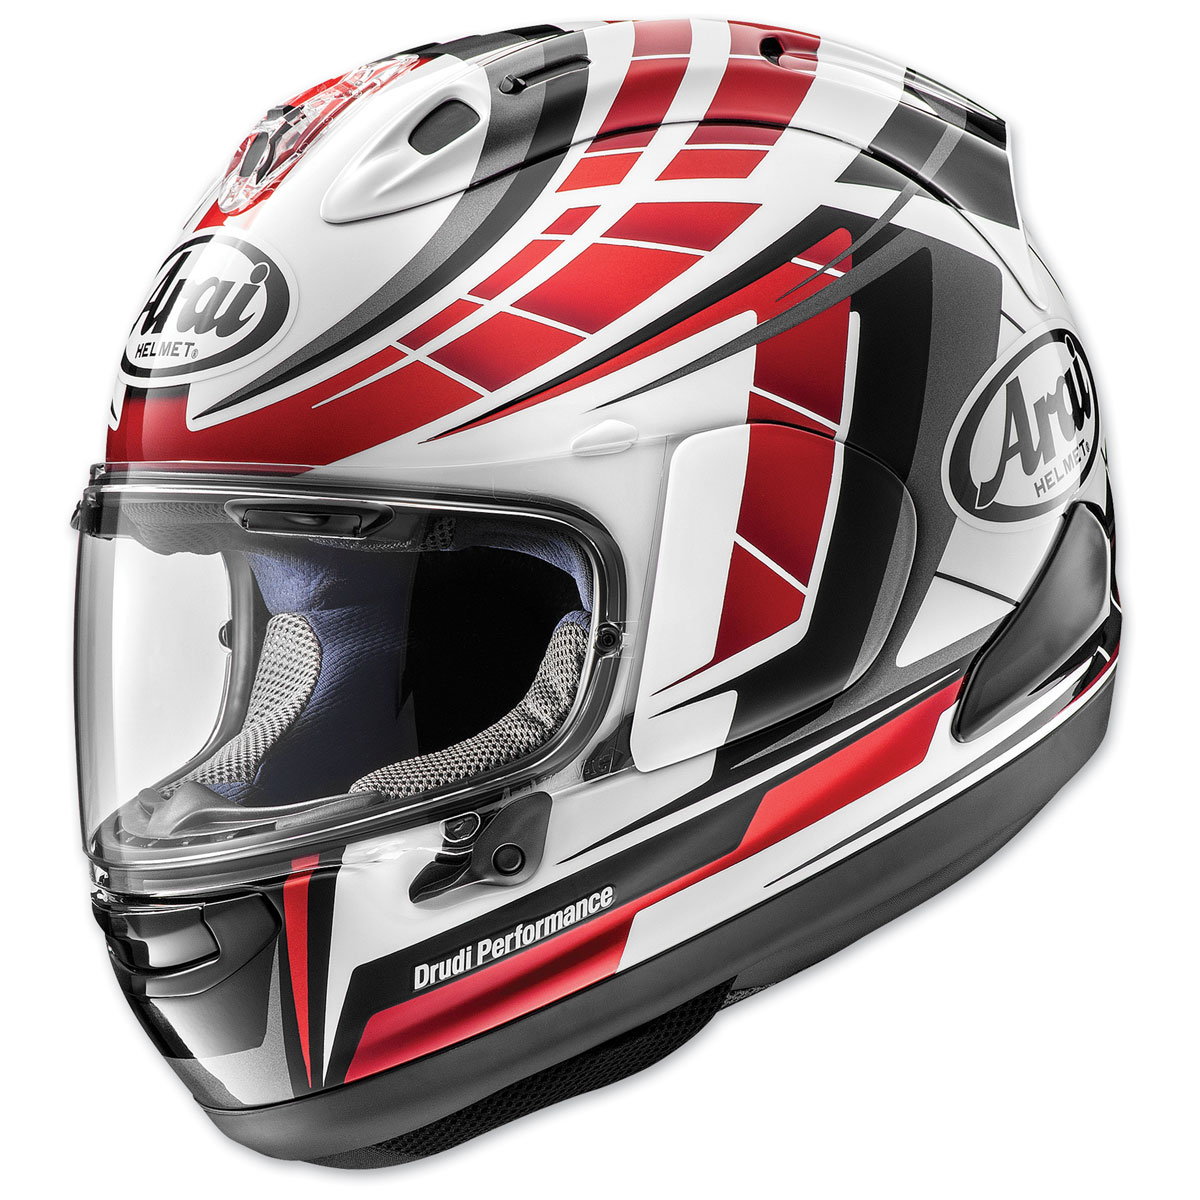 Arai Corsair-X Planet Red Full Face Helmet